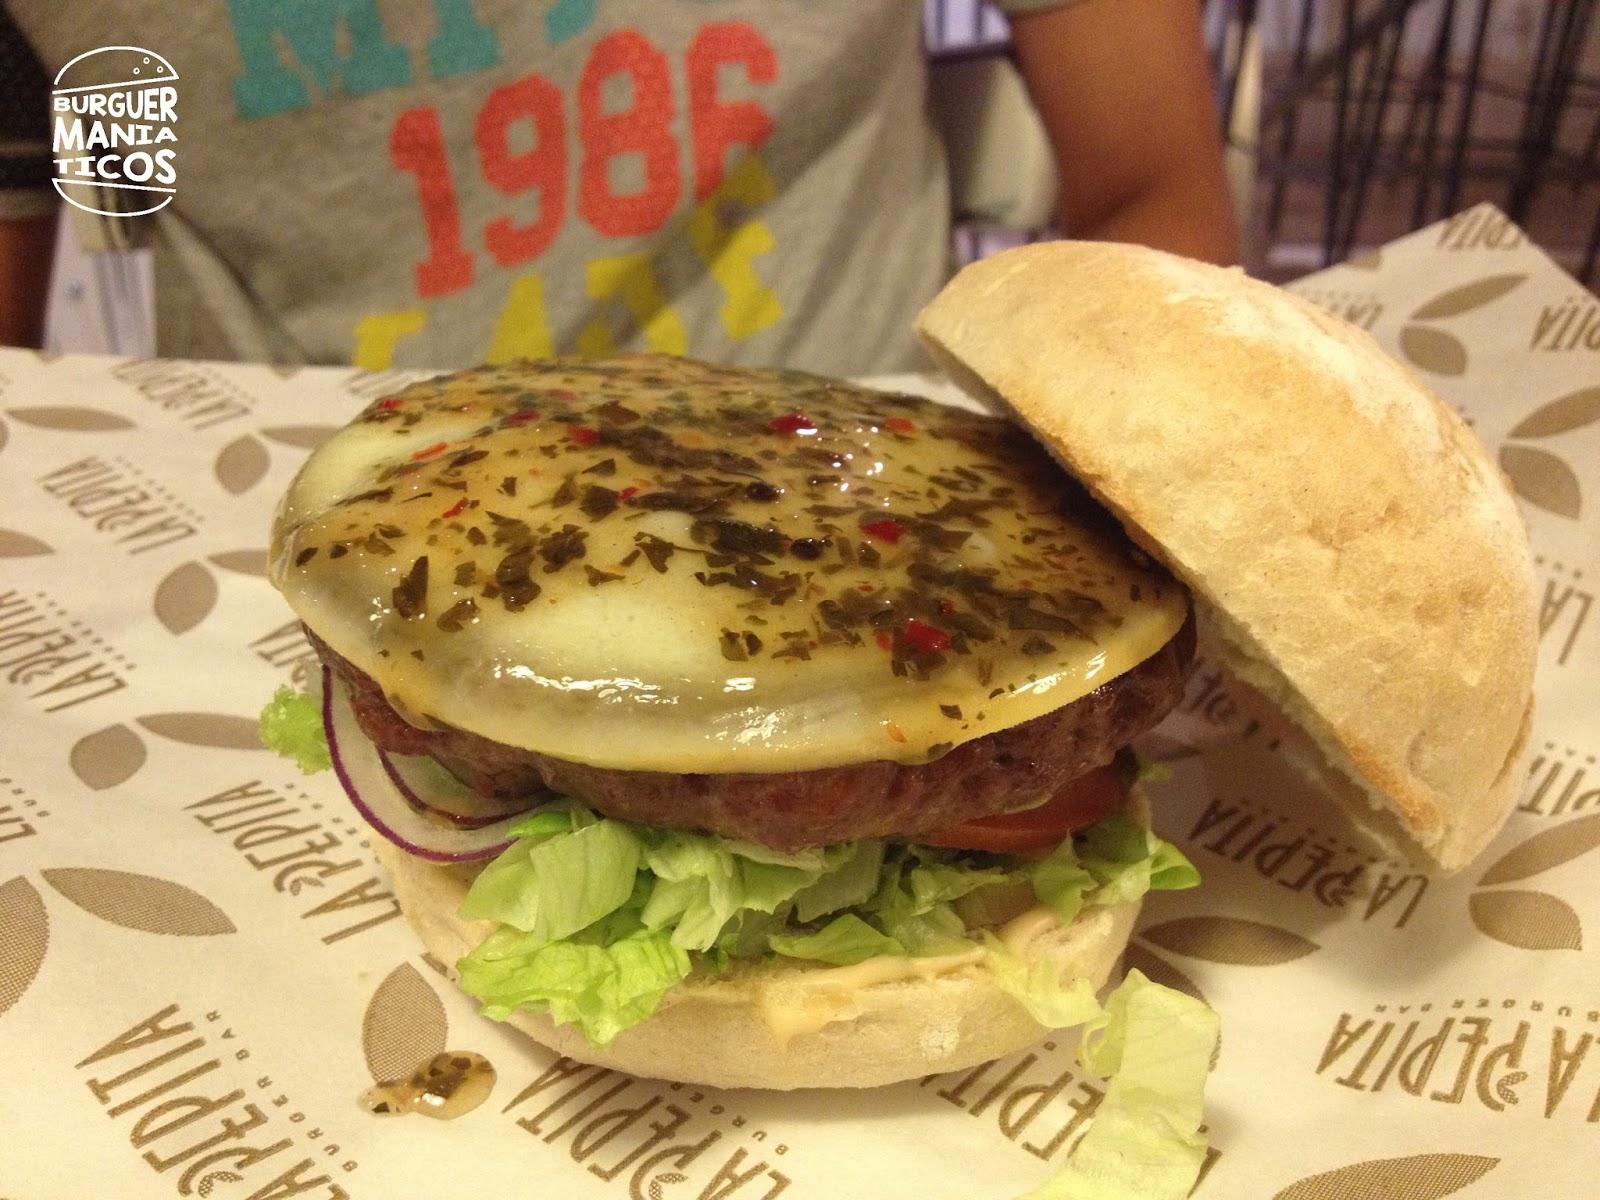 La pepita burger bar burguermani ticos for La pepita burger salamanca